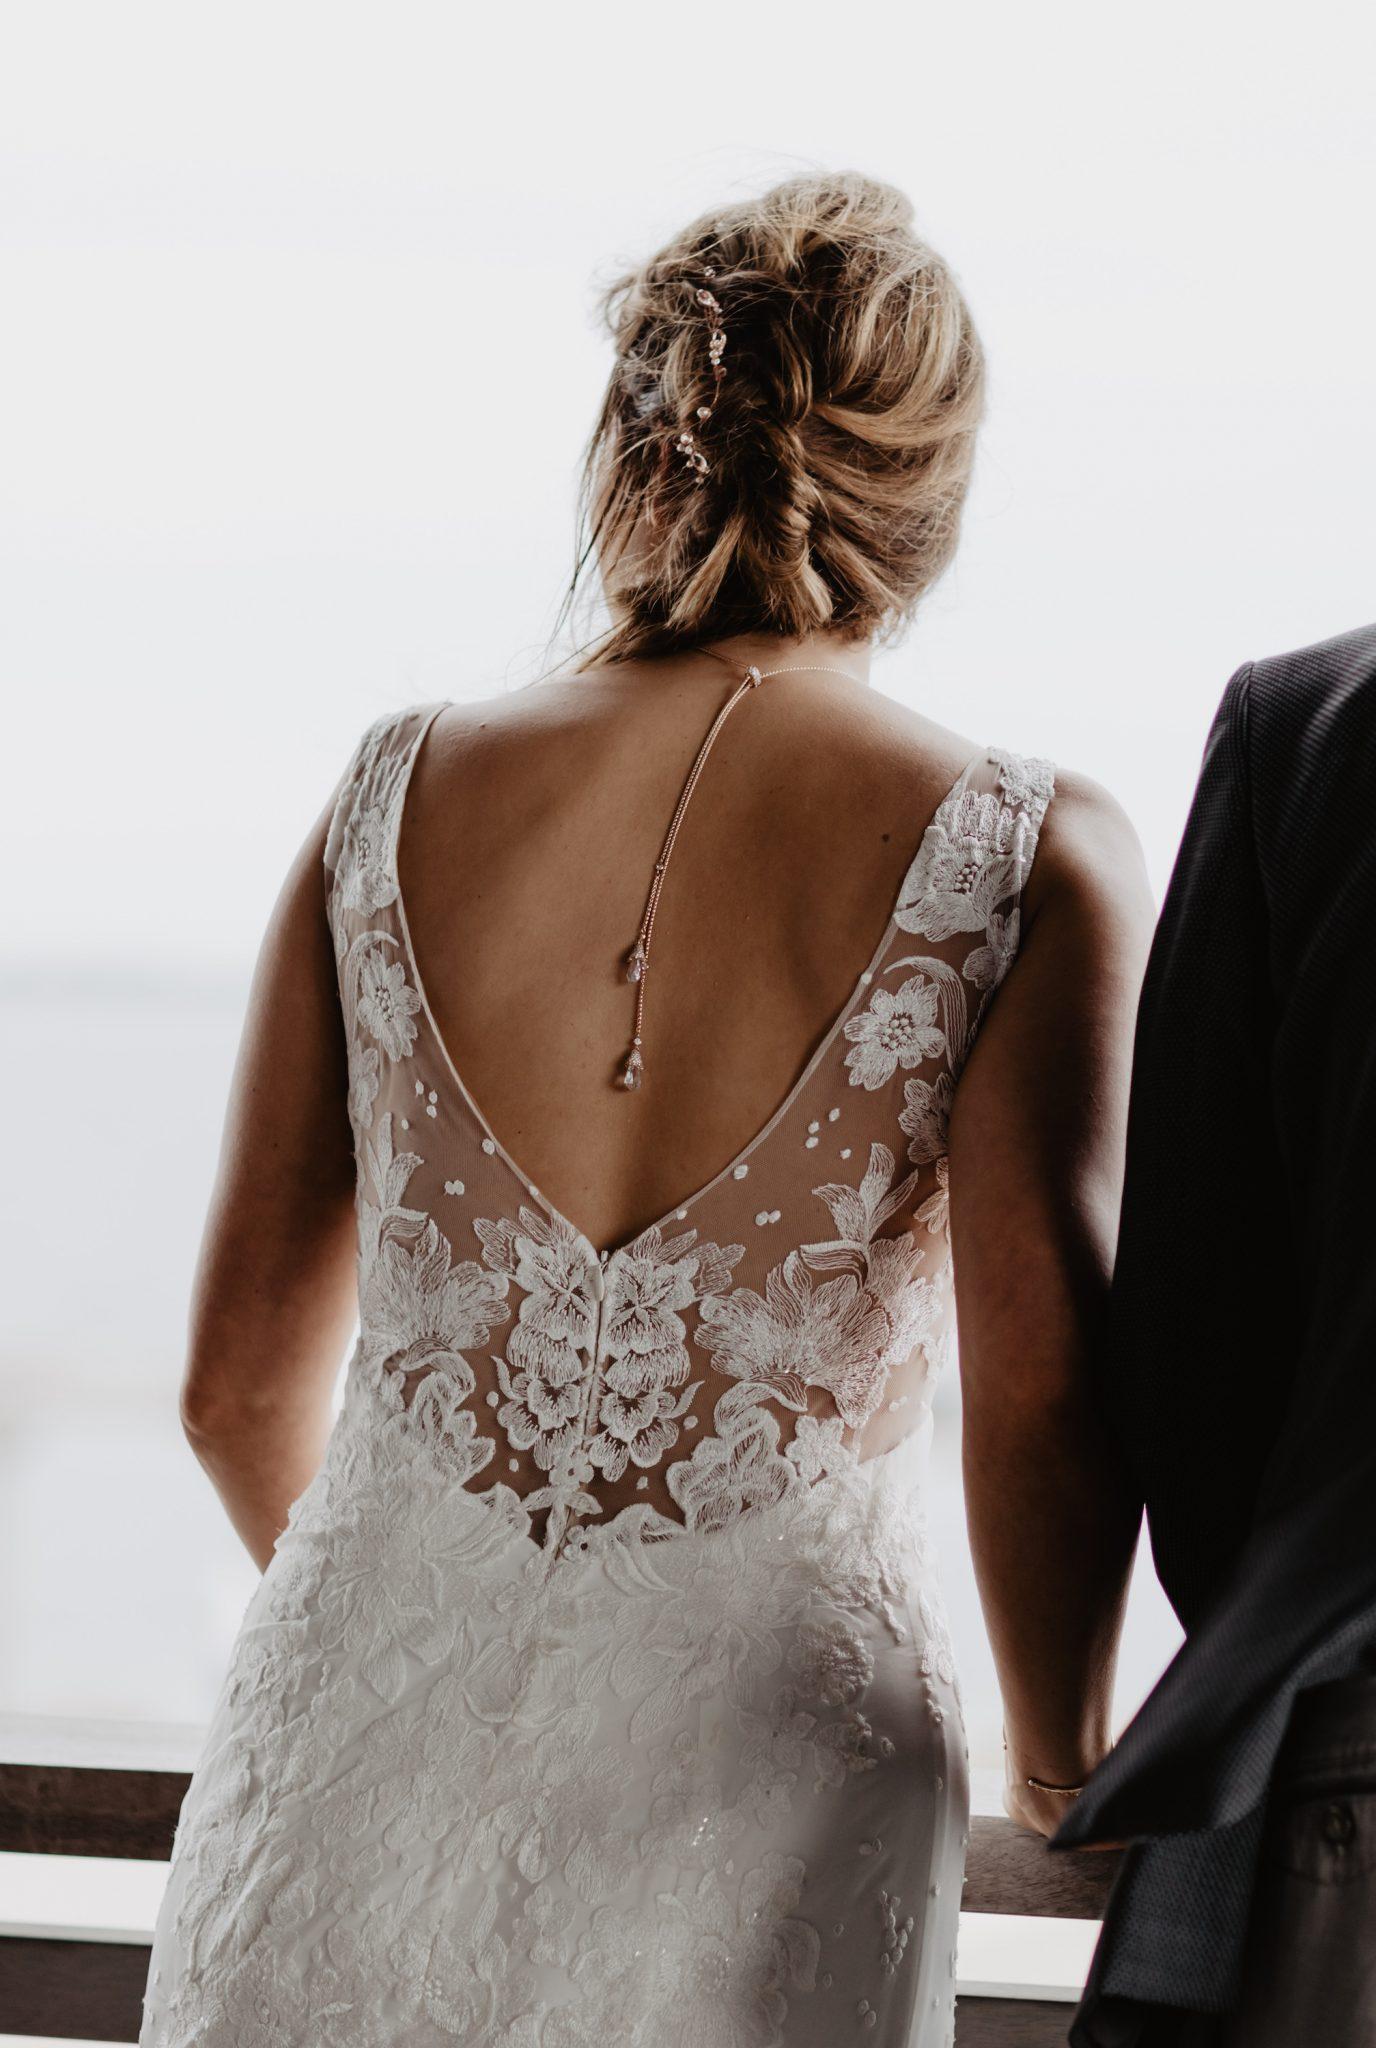 Hanneke Peters Couture - bruidscouture couture trouwjurk